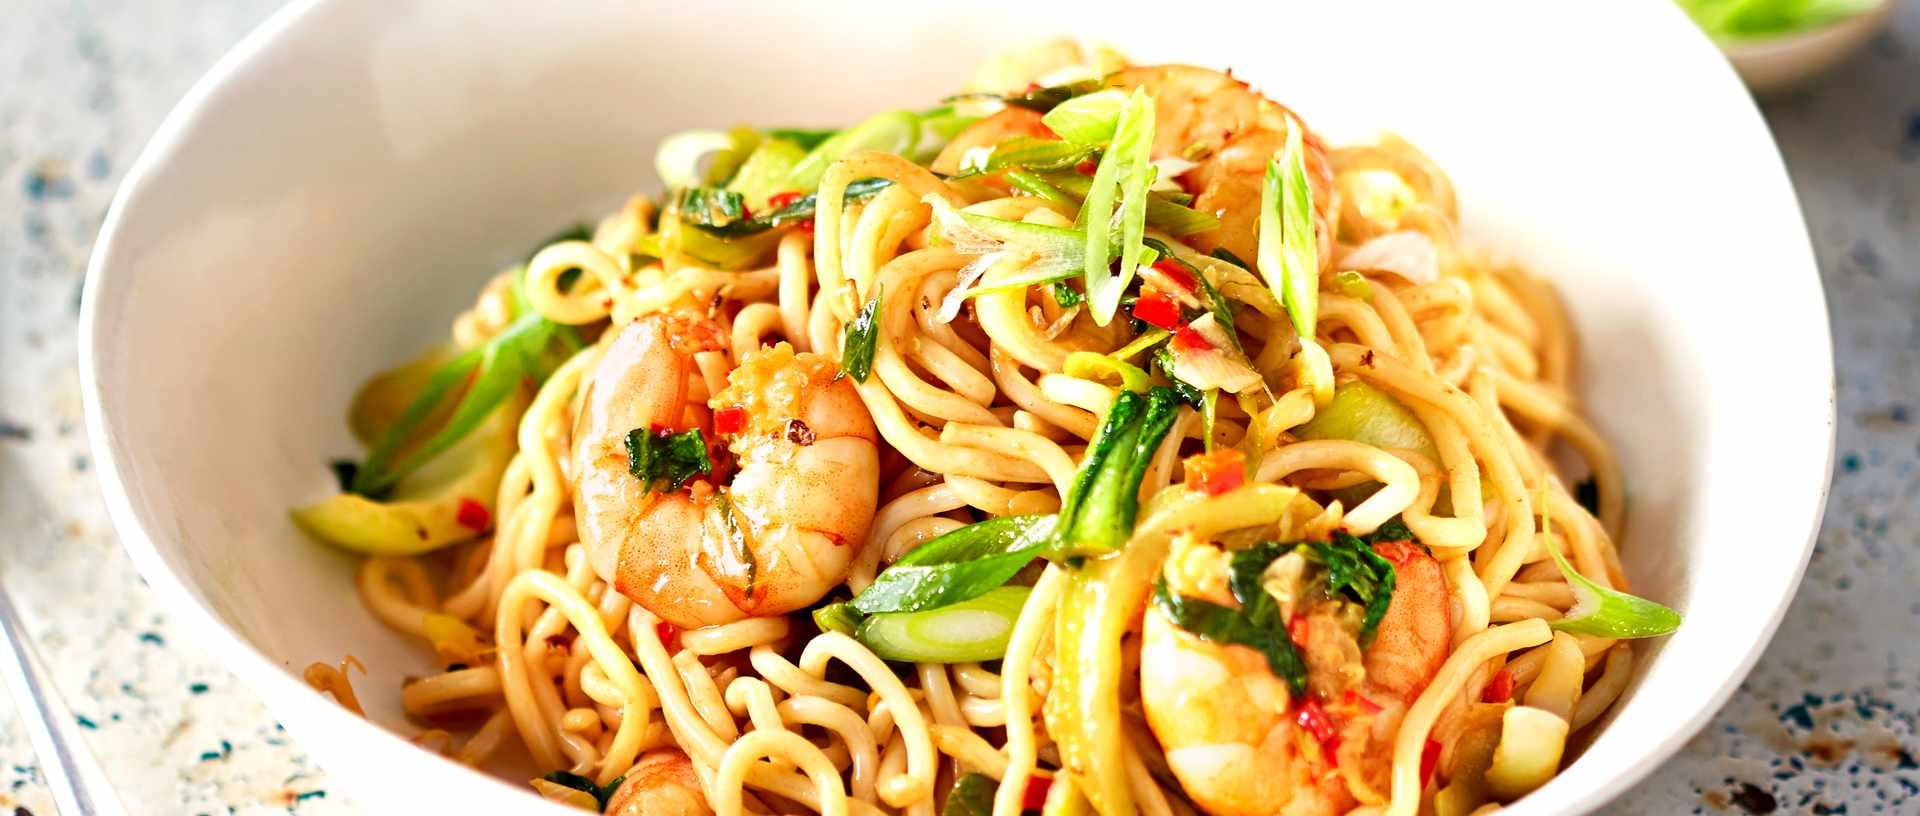 szechuan-prawn-noodles